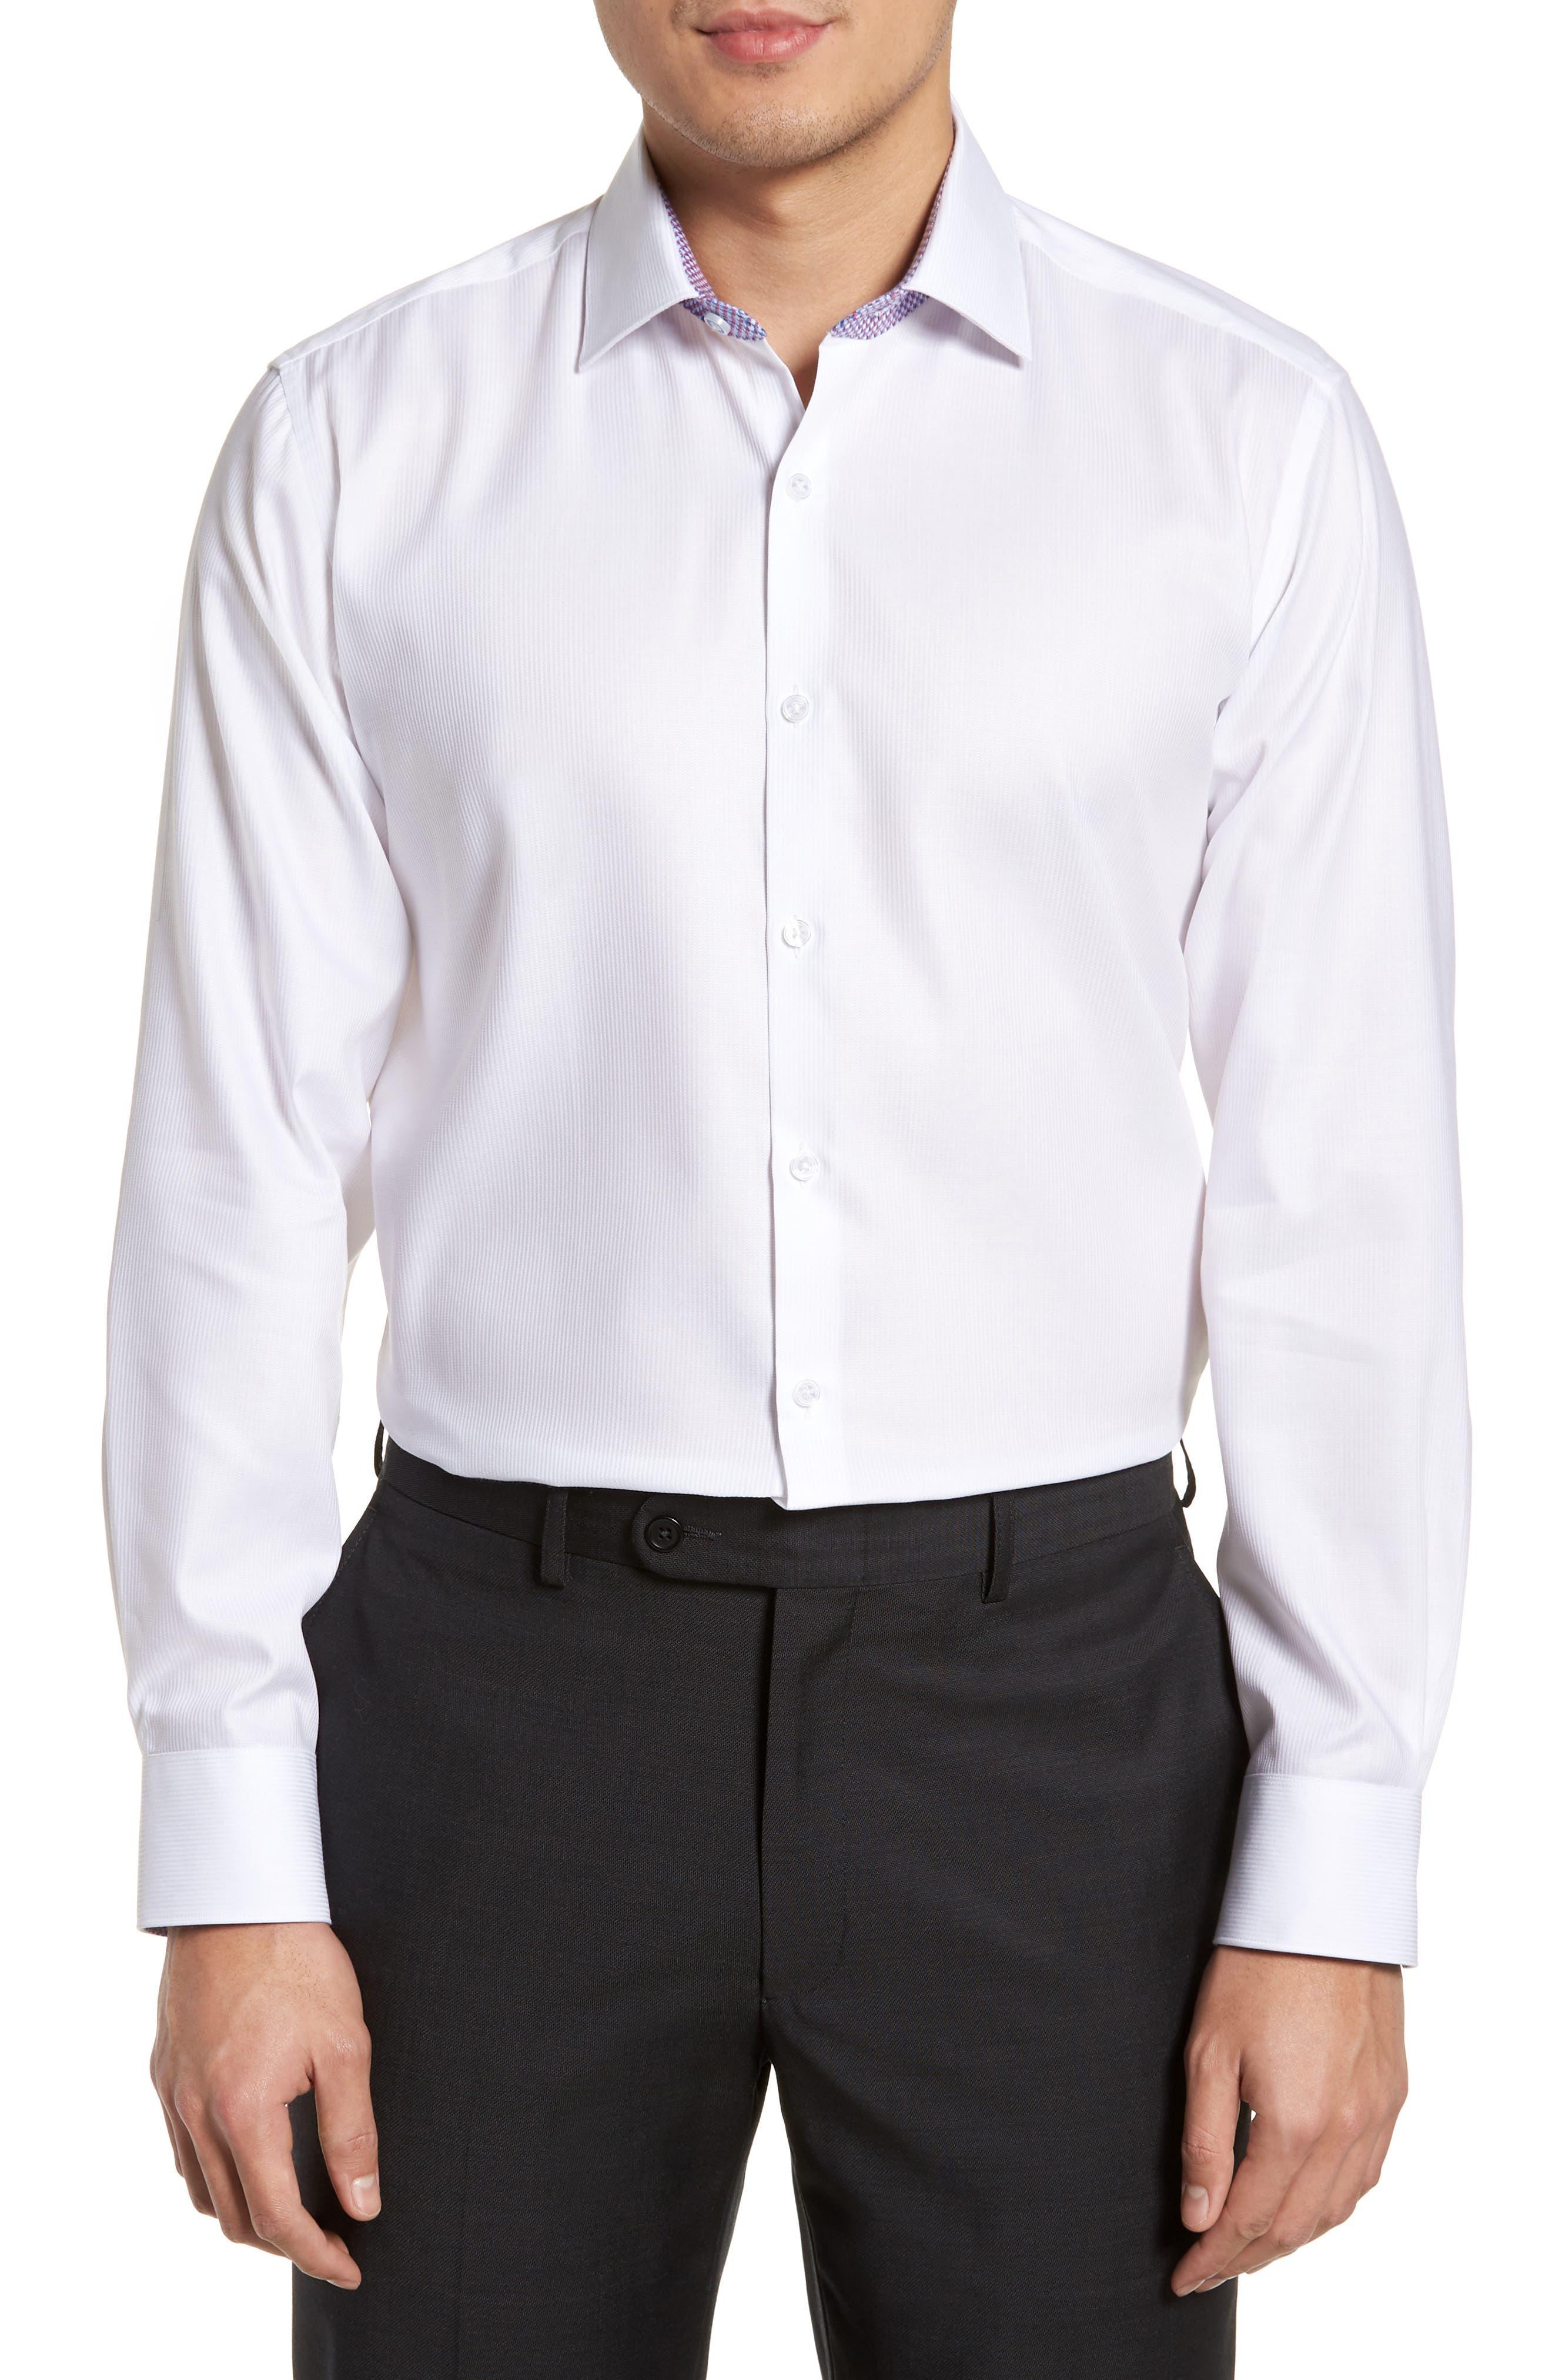 Becker Trim Fit Stripe Dress Shirt,                         Main,                         color, White